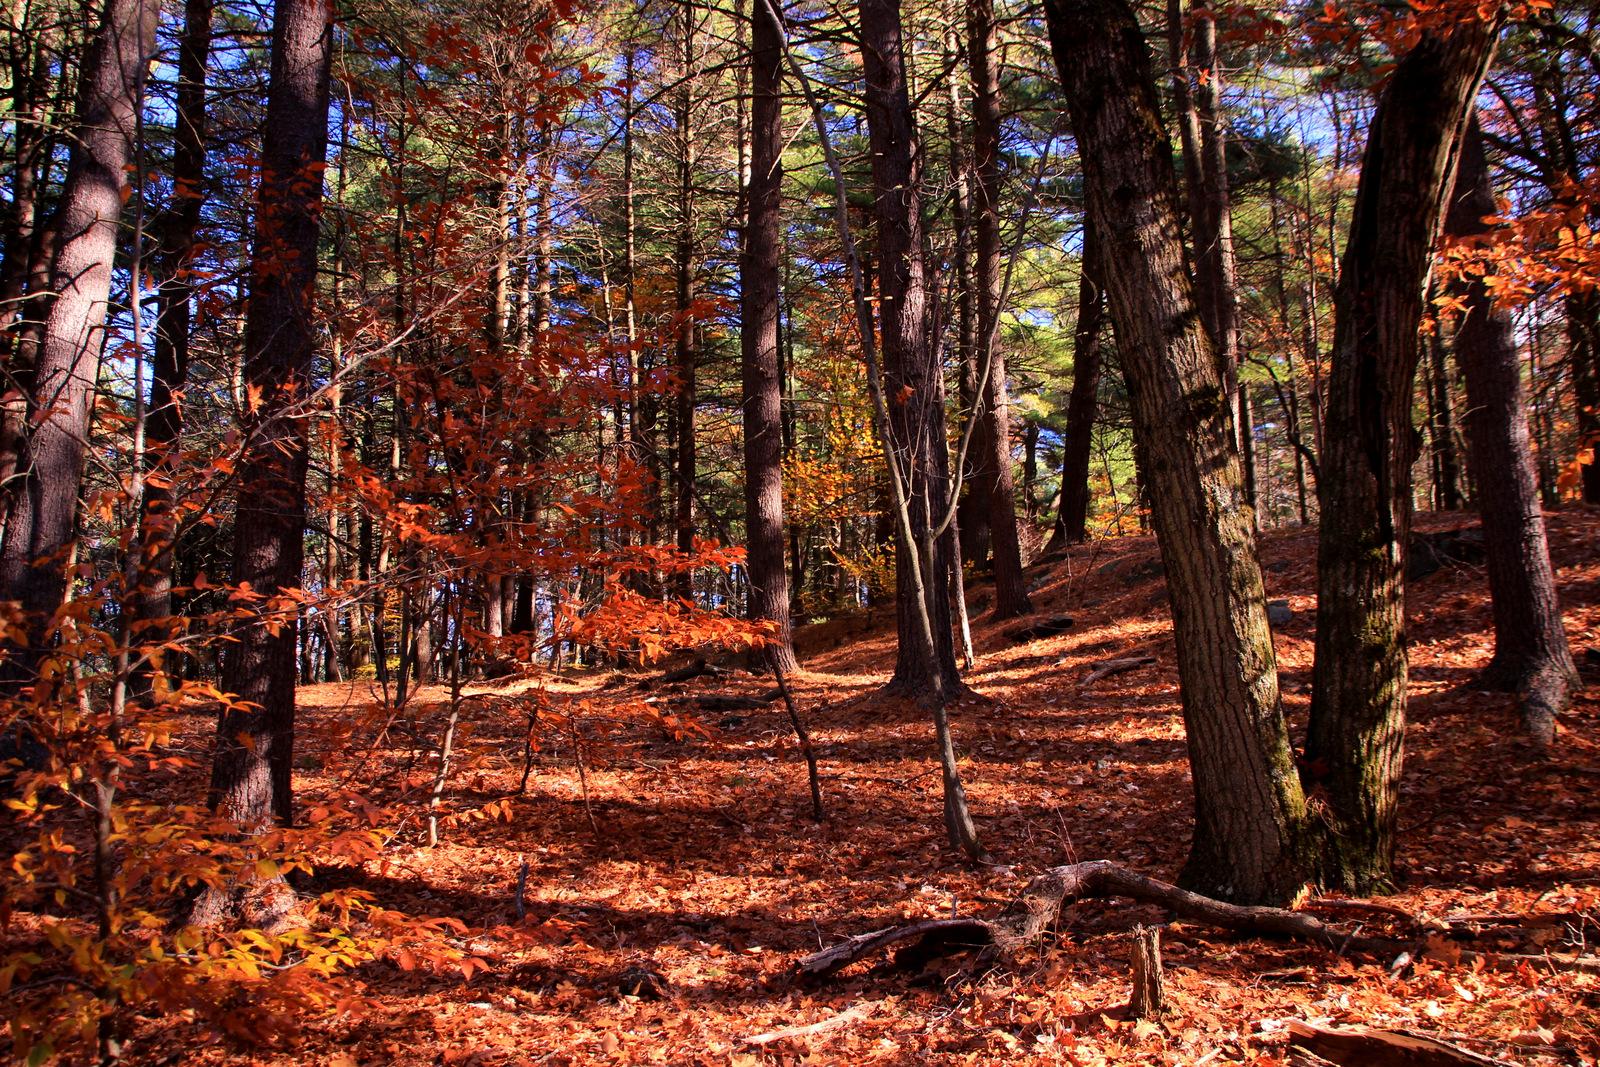 Fall 2015, Blue Hills Reservation, Novmeber 8, 2015